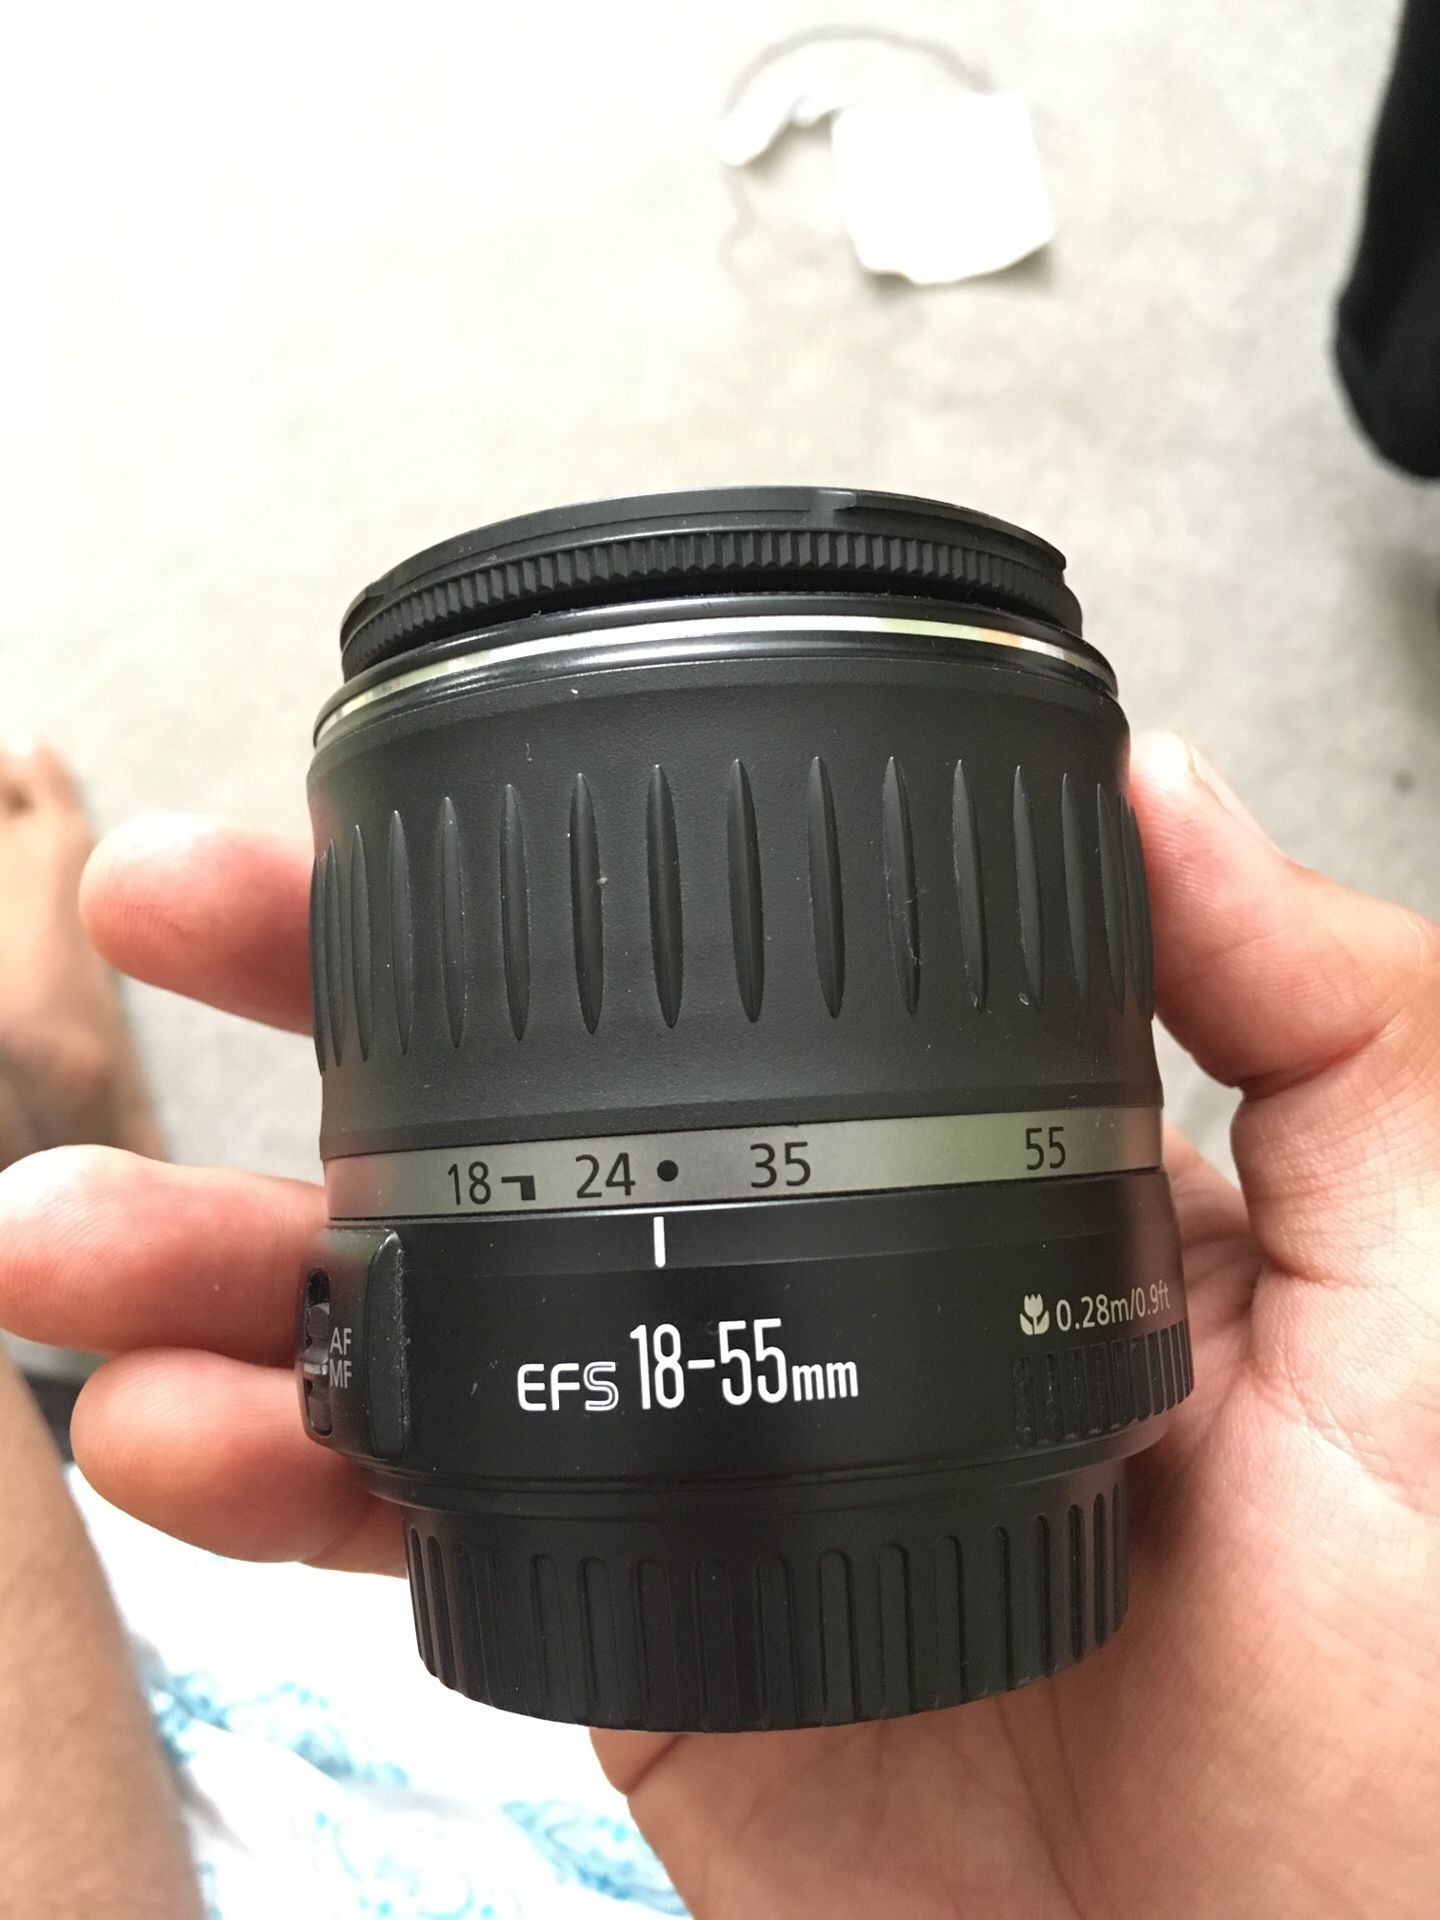 Canon EFS 18-55mm camera lens